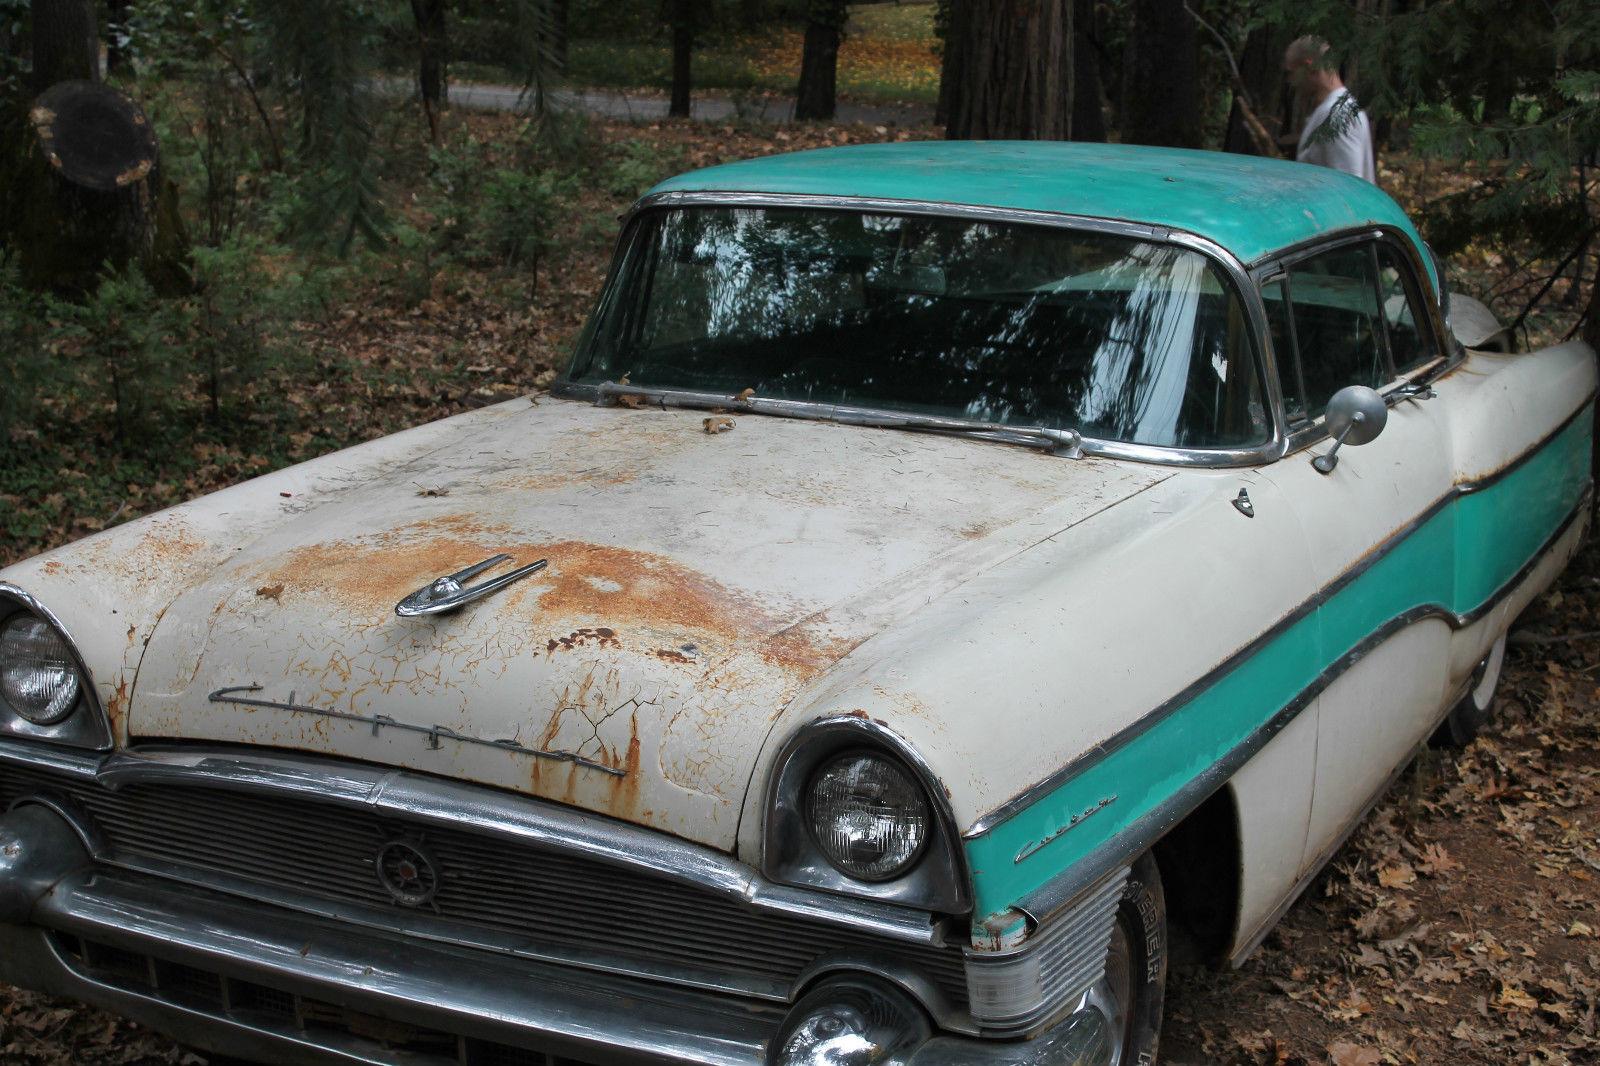 Modern Classic Cars For Sale California Frieze - Classic Cars Ideas ...